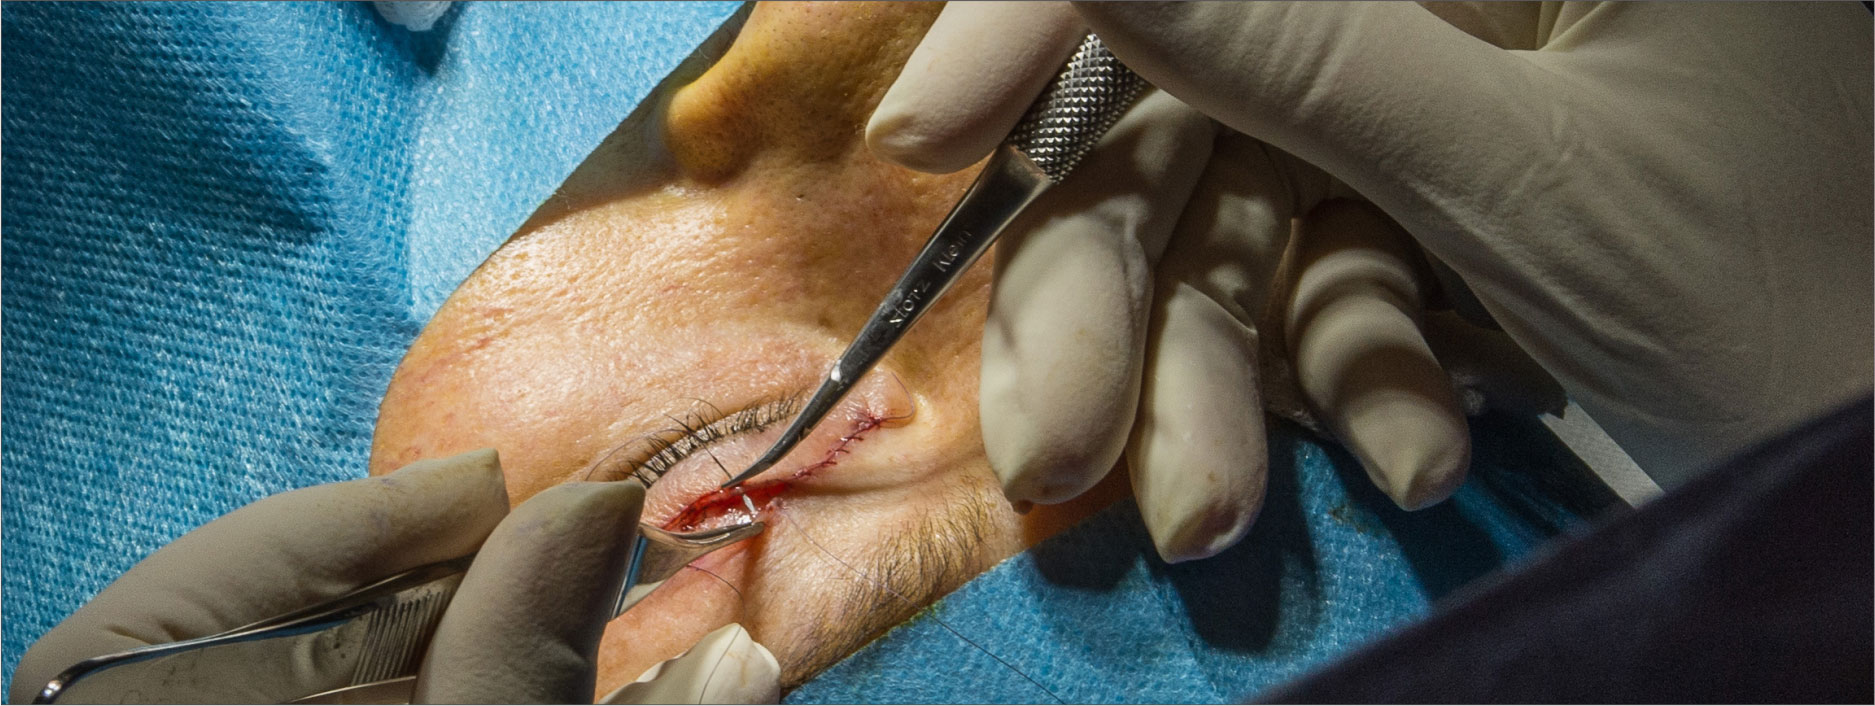 chirurgie-oculoplastica